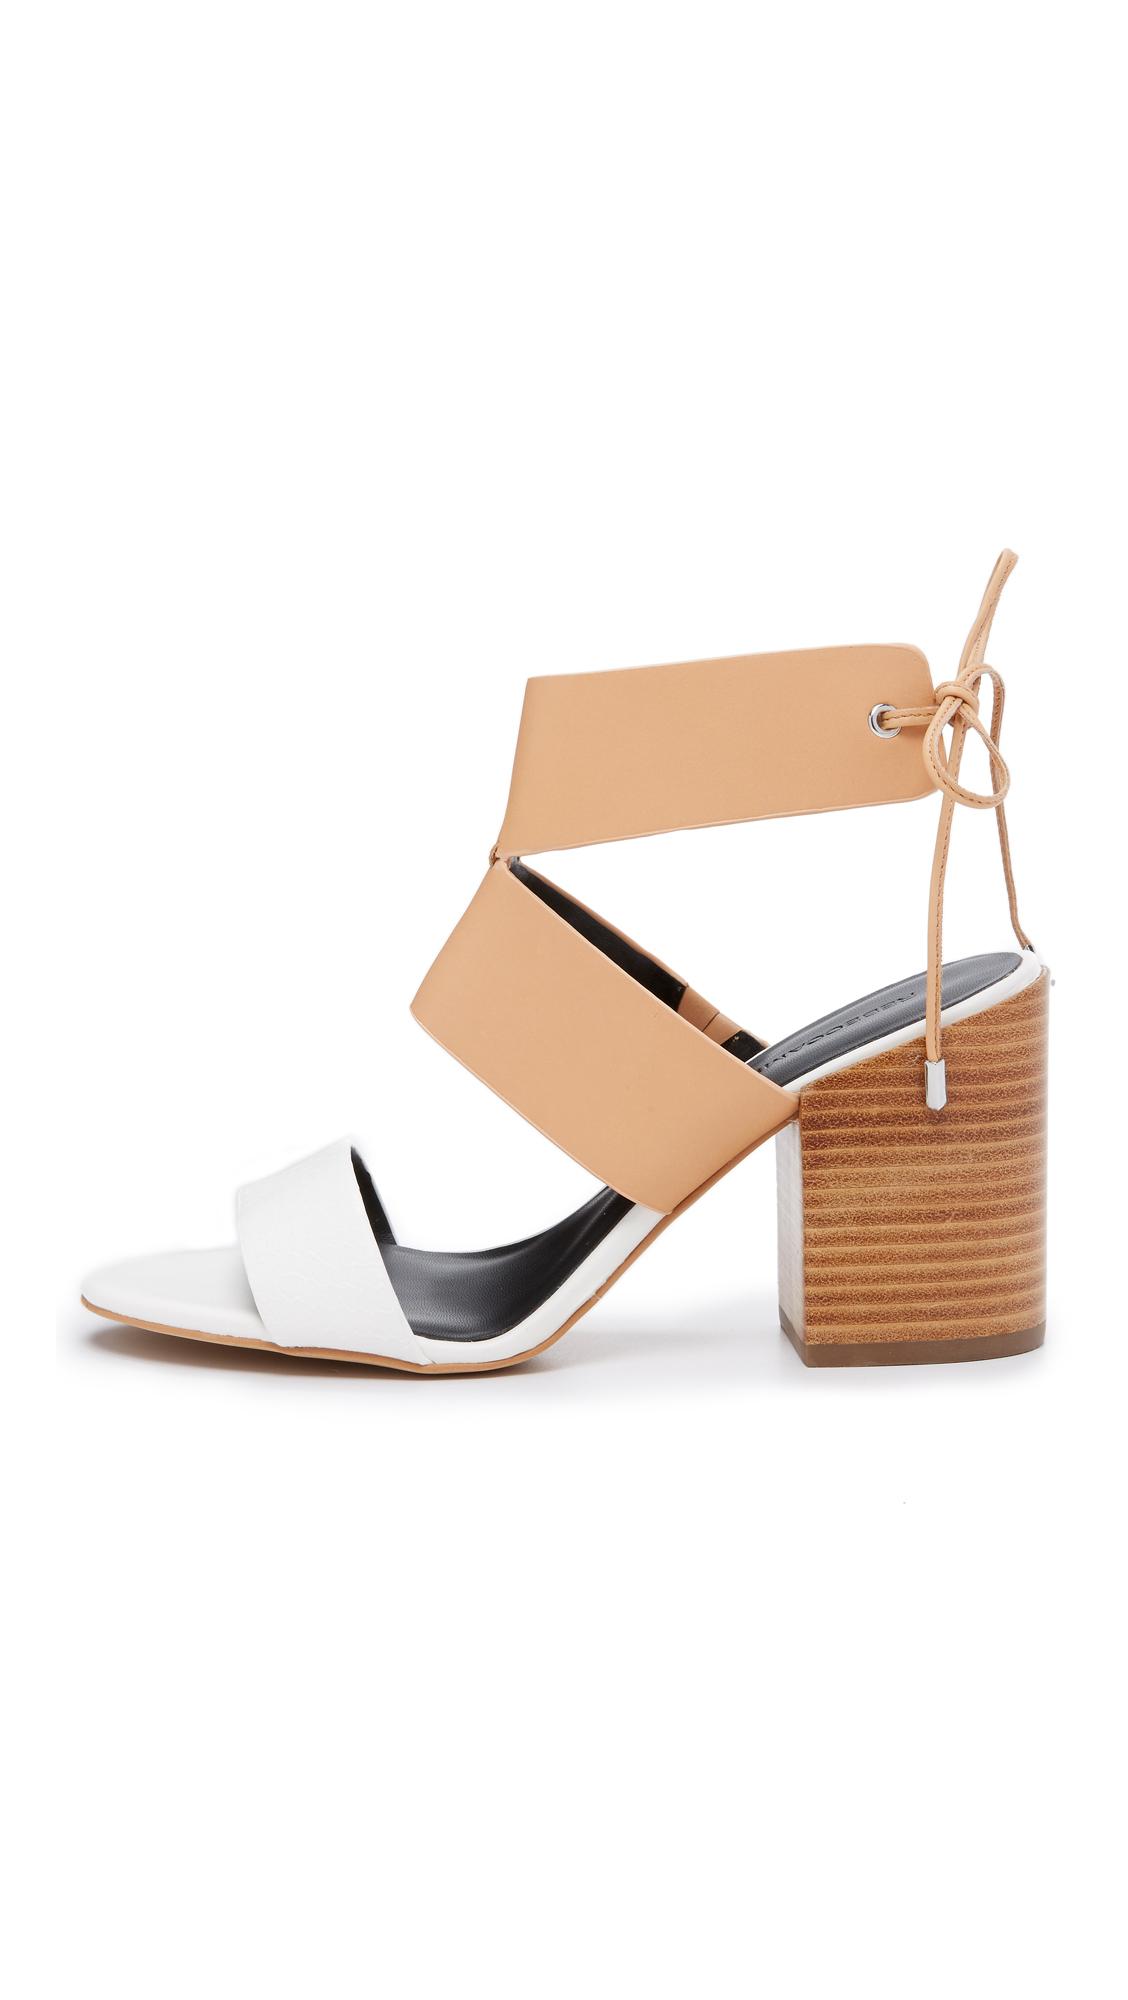 a562ba07764 Rebecca Minkoff Christy City Sandals